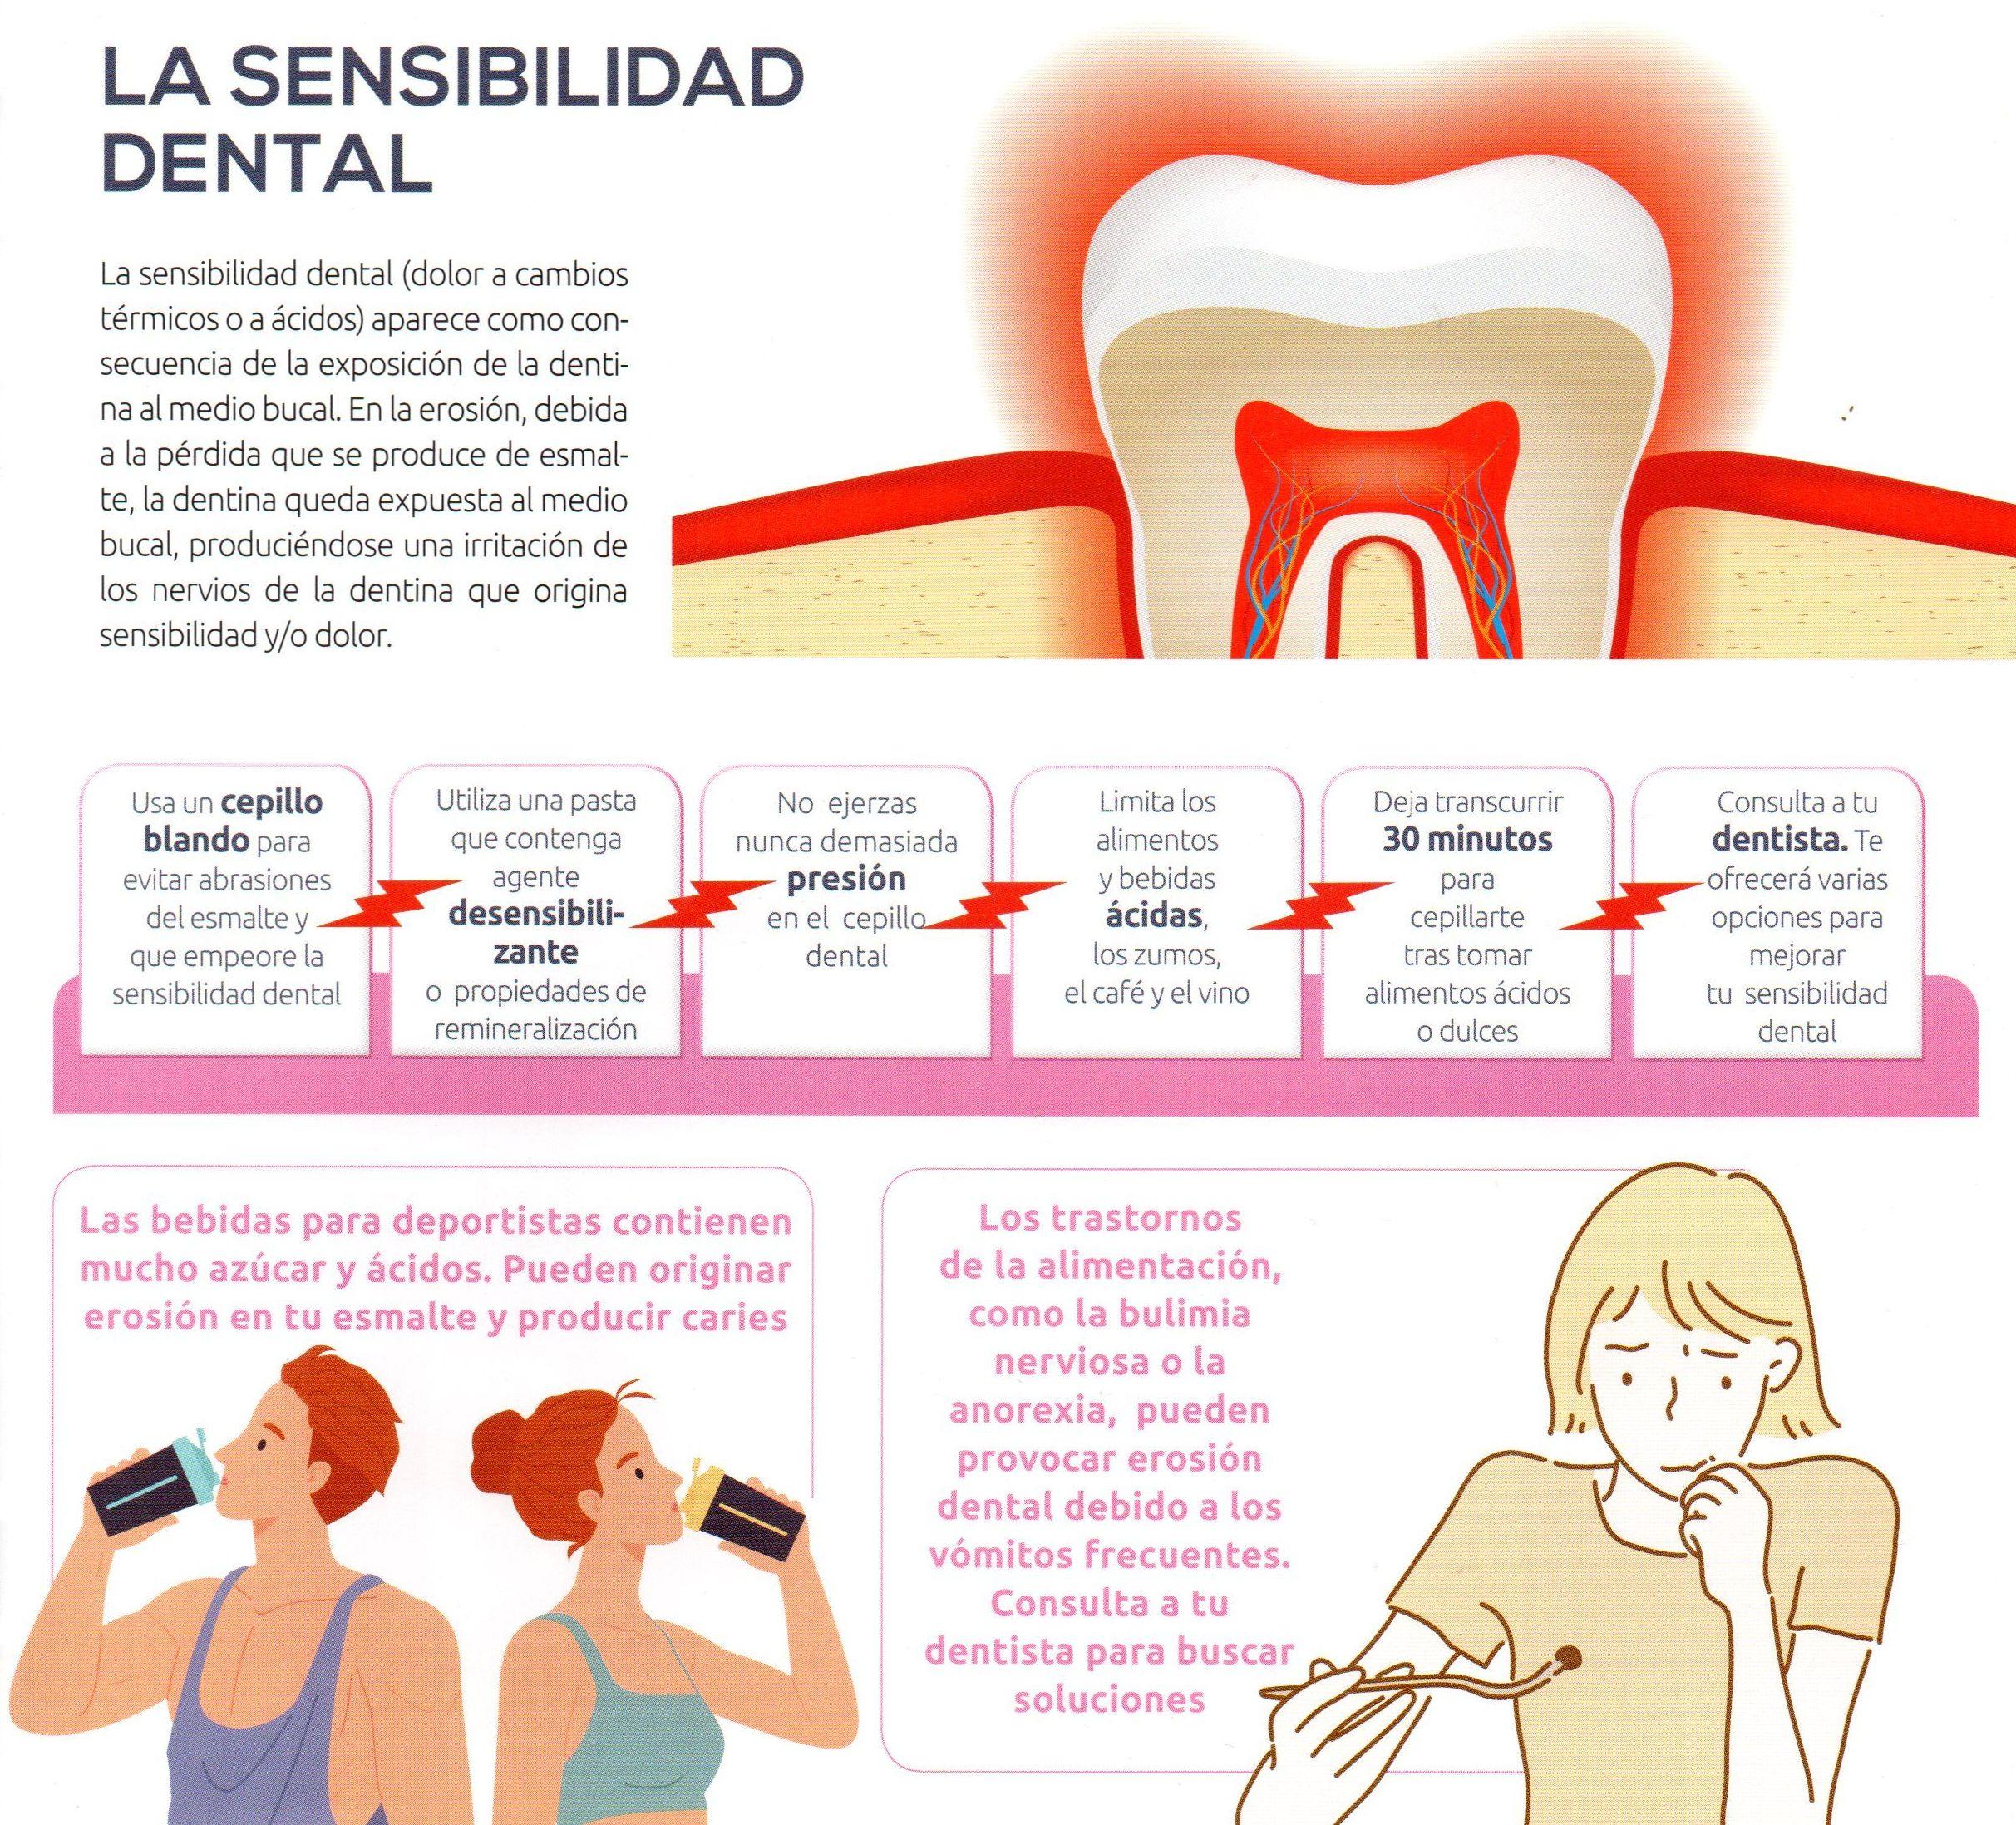 dentista en cadiz javier perez implantes